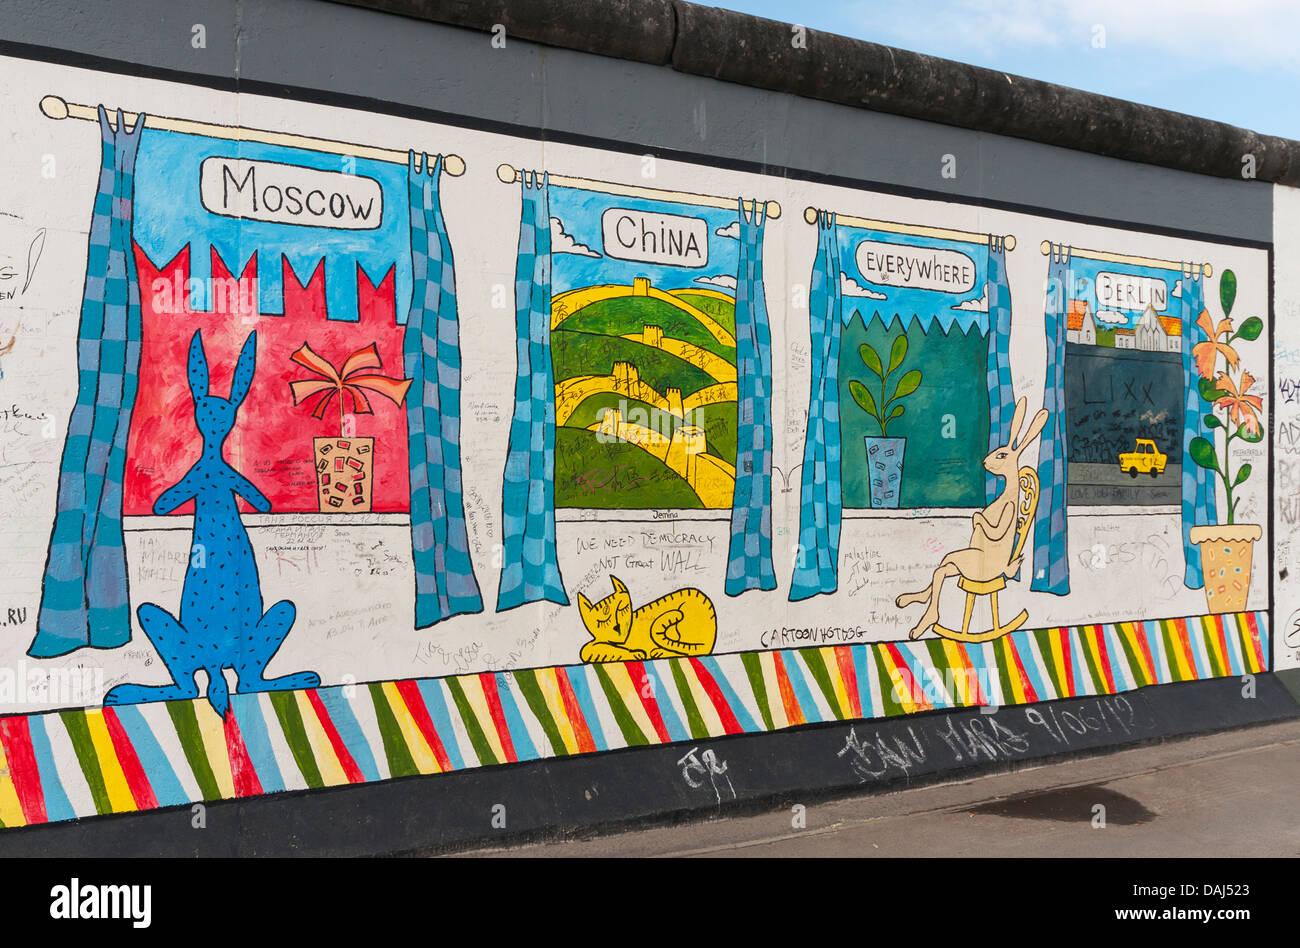 Internazionale Di Pittura Murale Da Aleksey Taranin La East Side Gallery Il Muro Di Berlino Berliner Mauer Germania Foto Stock Alamy